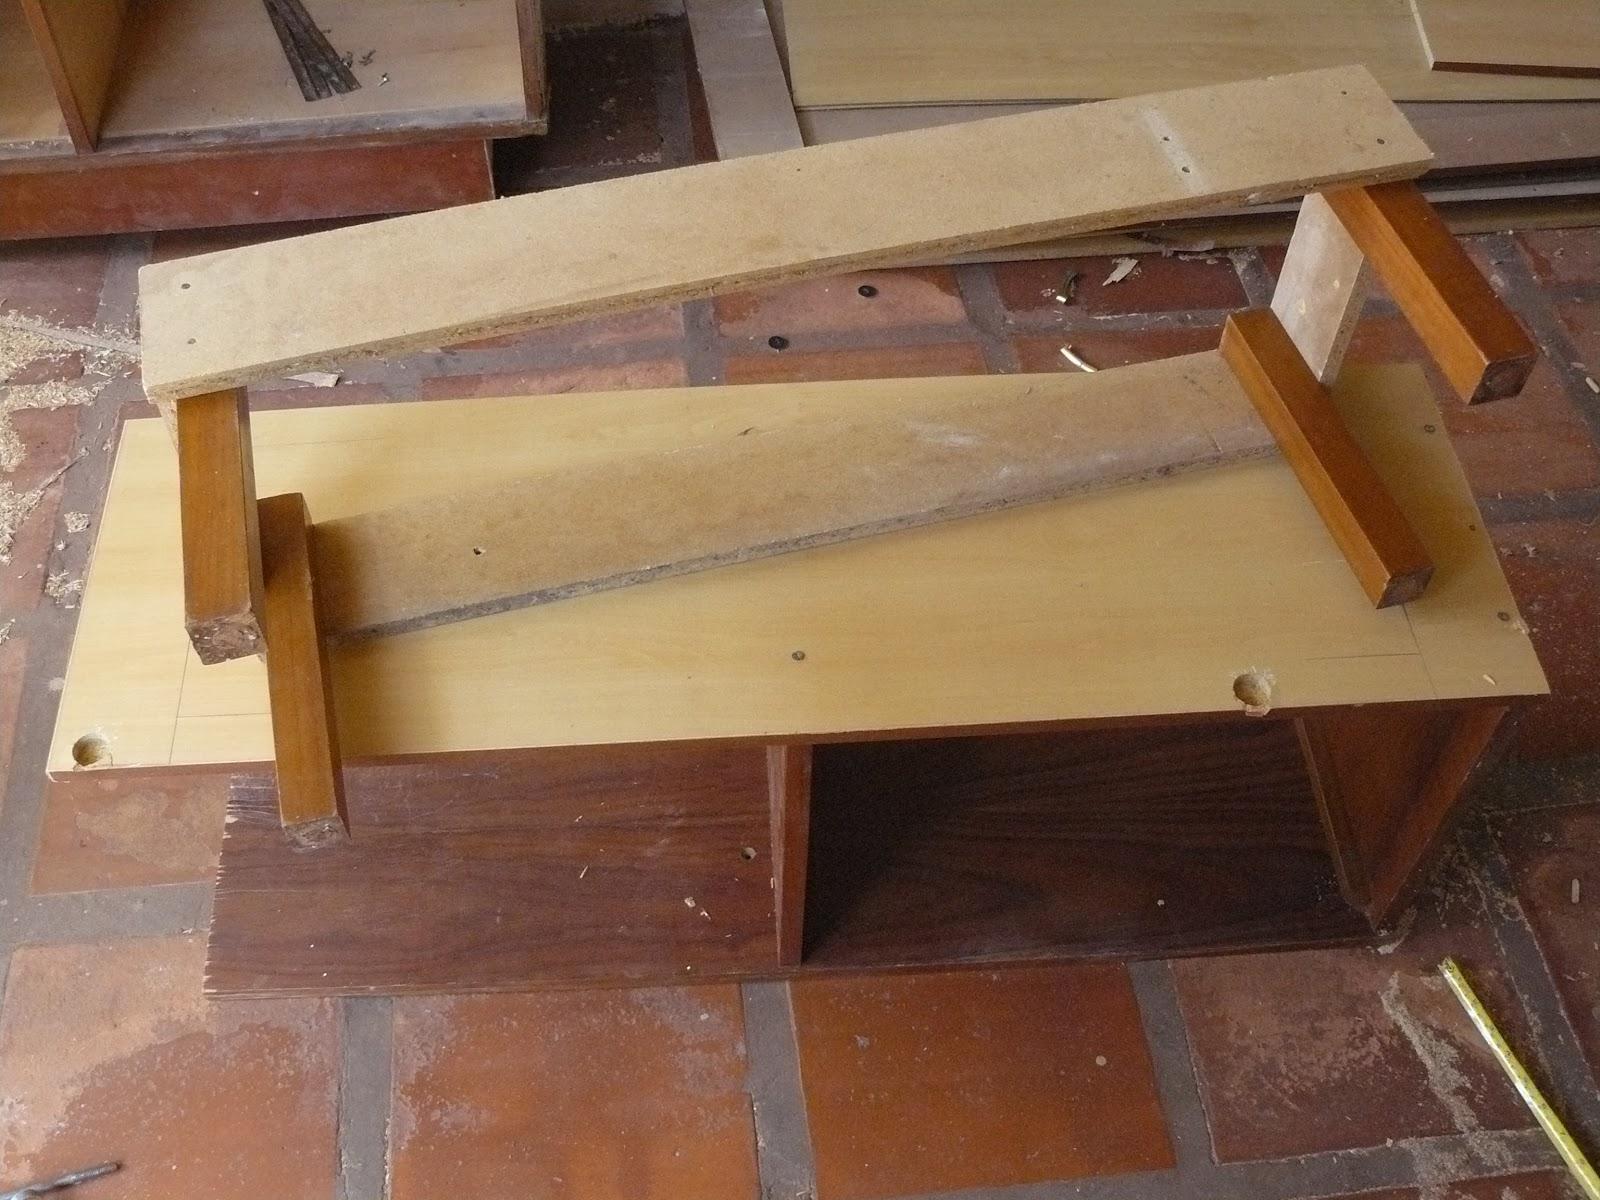 de madeira) comece juntando as partes para montar a base do móvel ou #9D662E 1600x1200